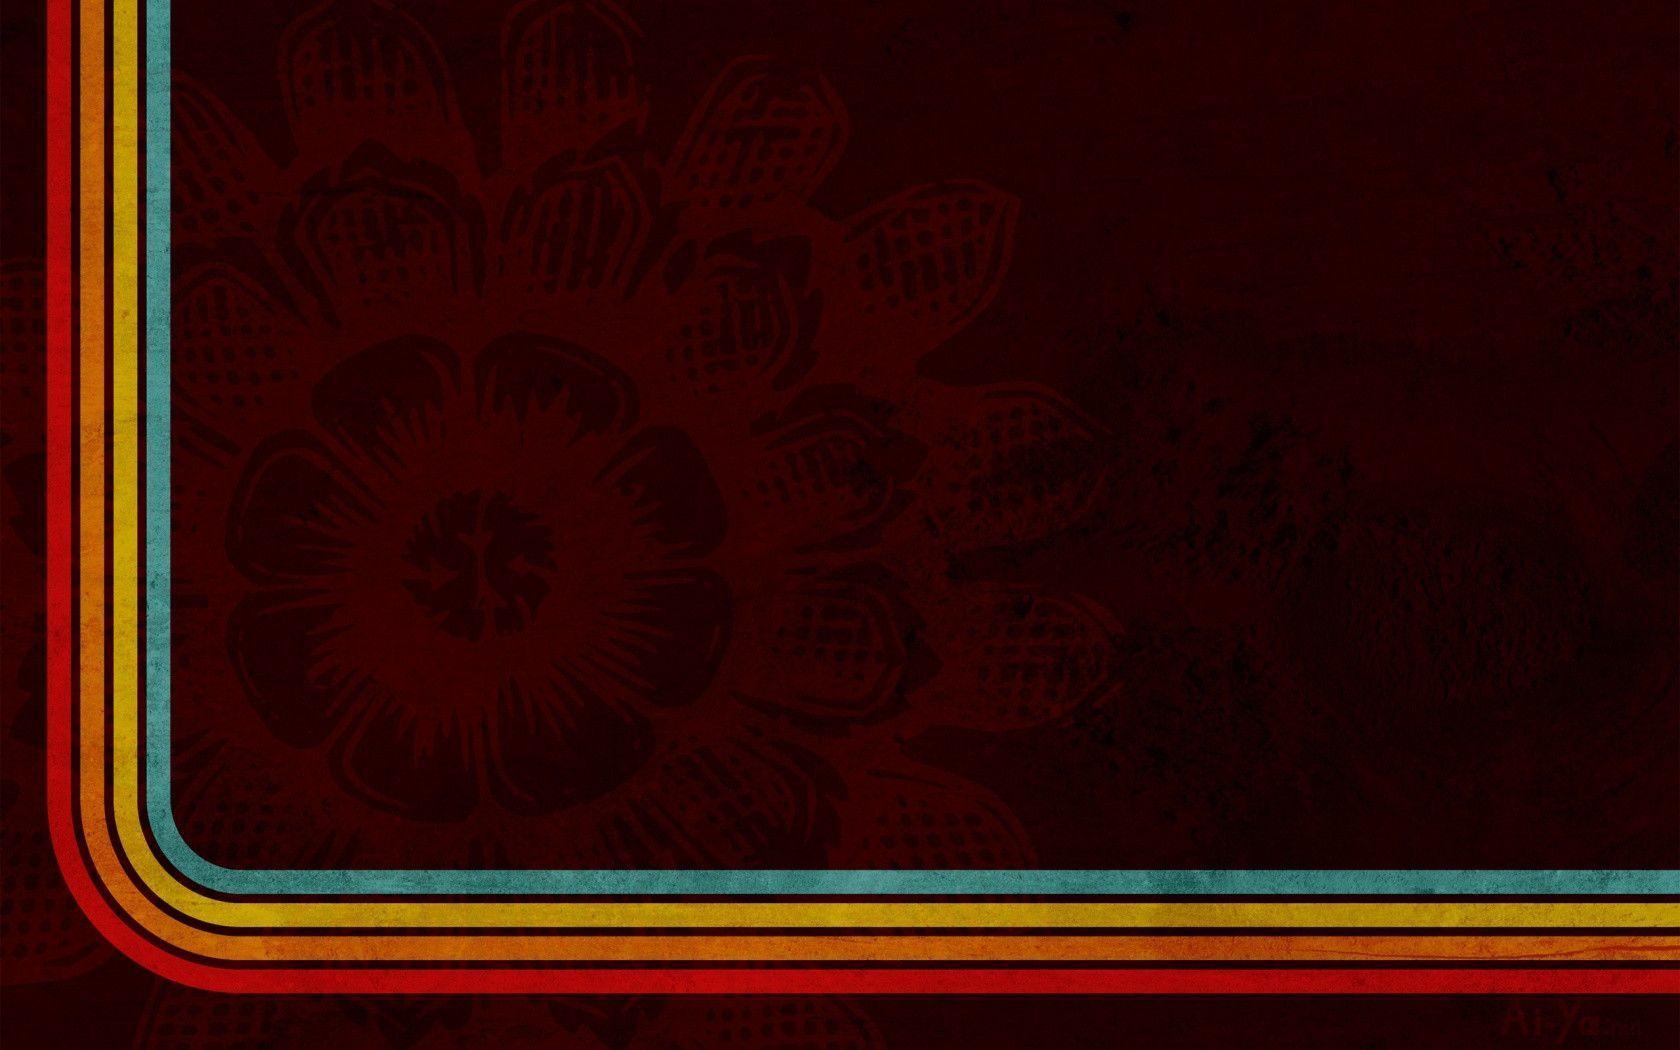 Retro Desktop Wallpapers - Wallpaper Cave